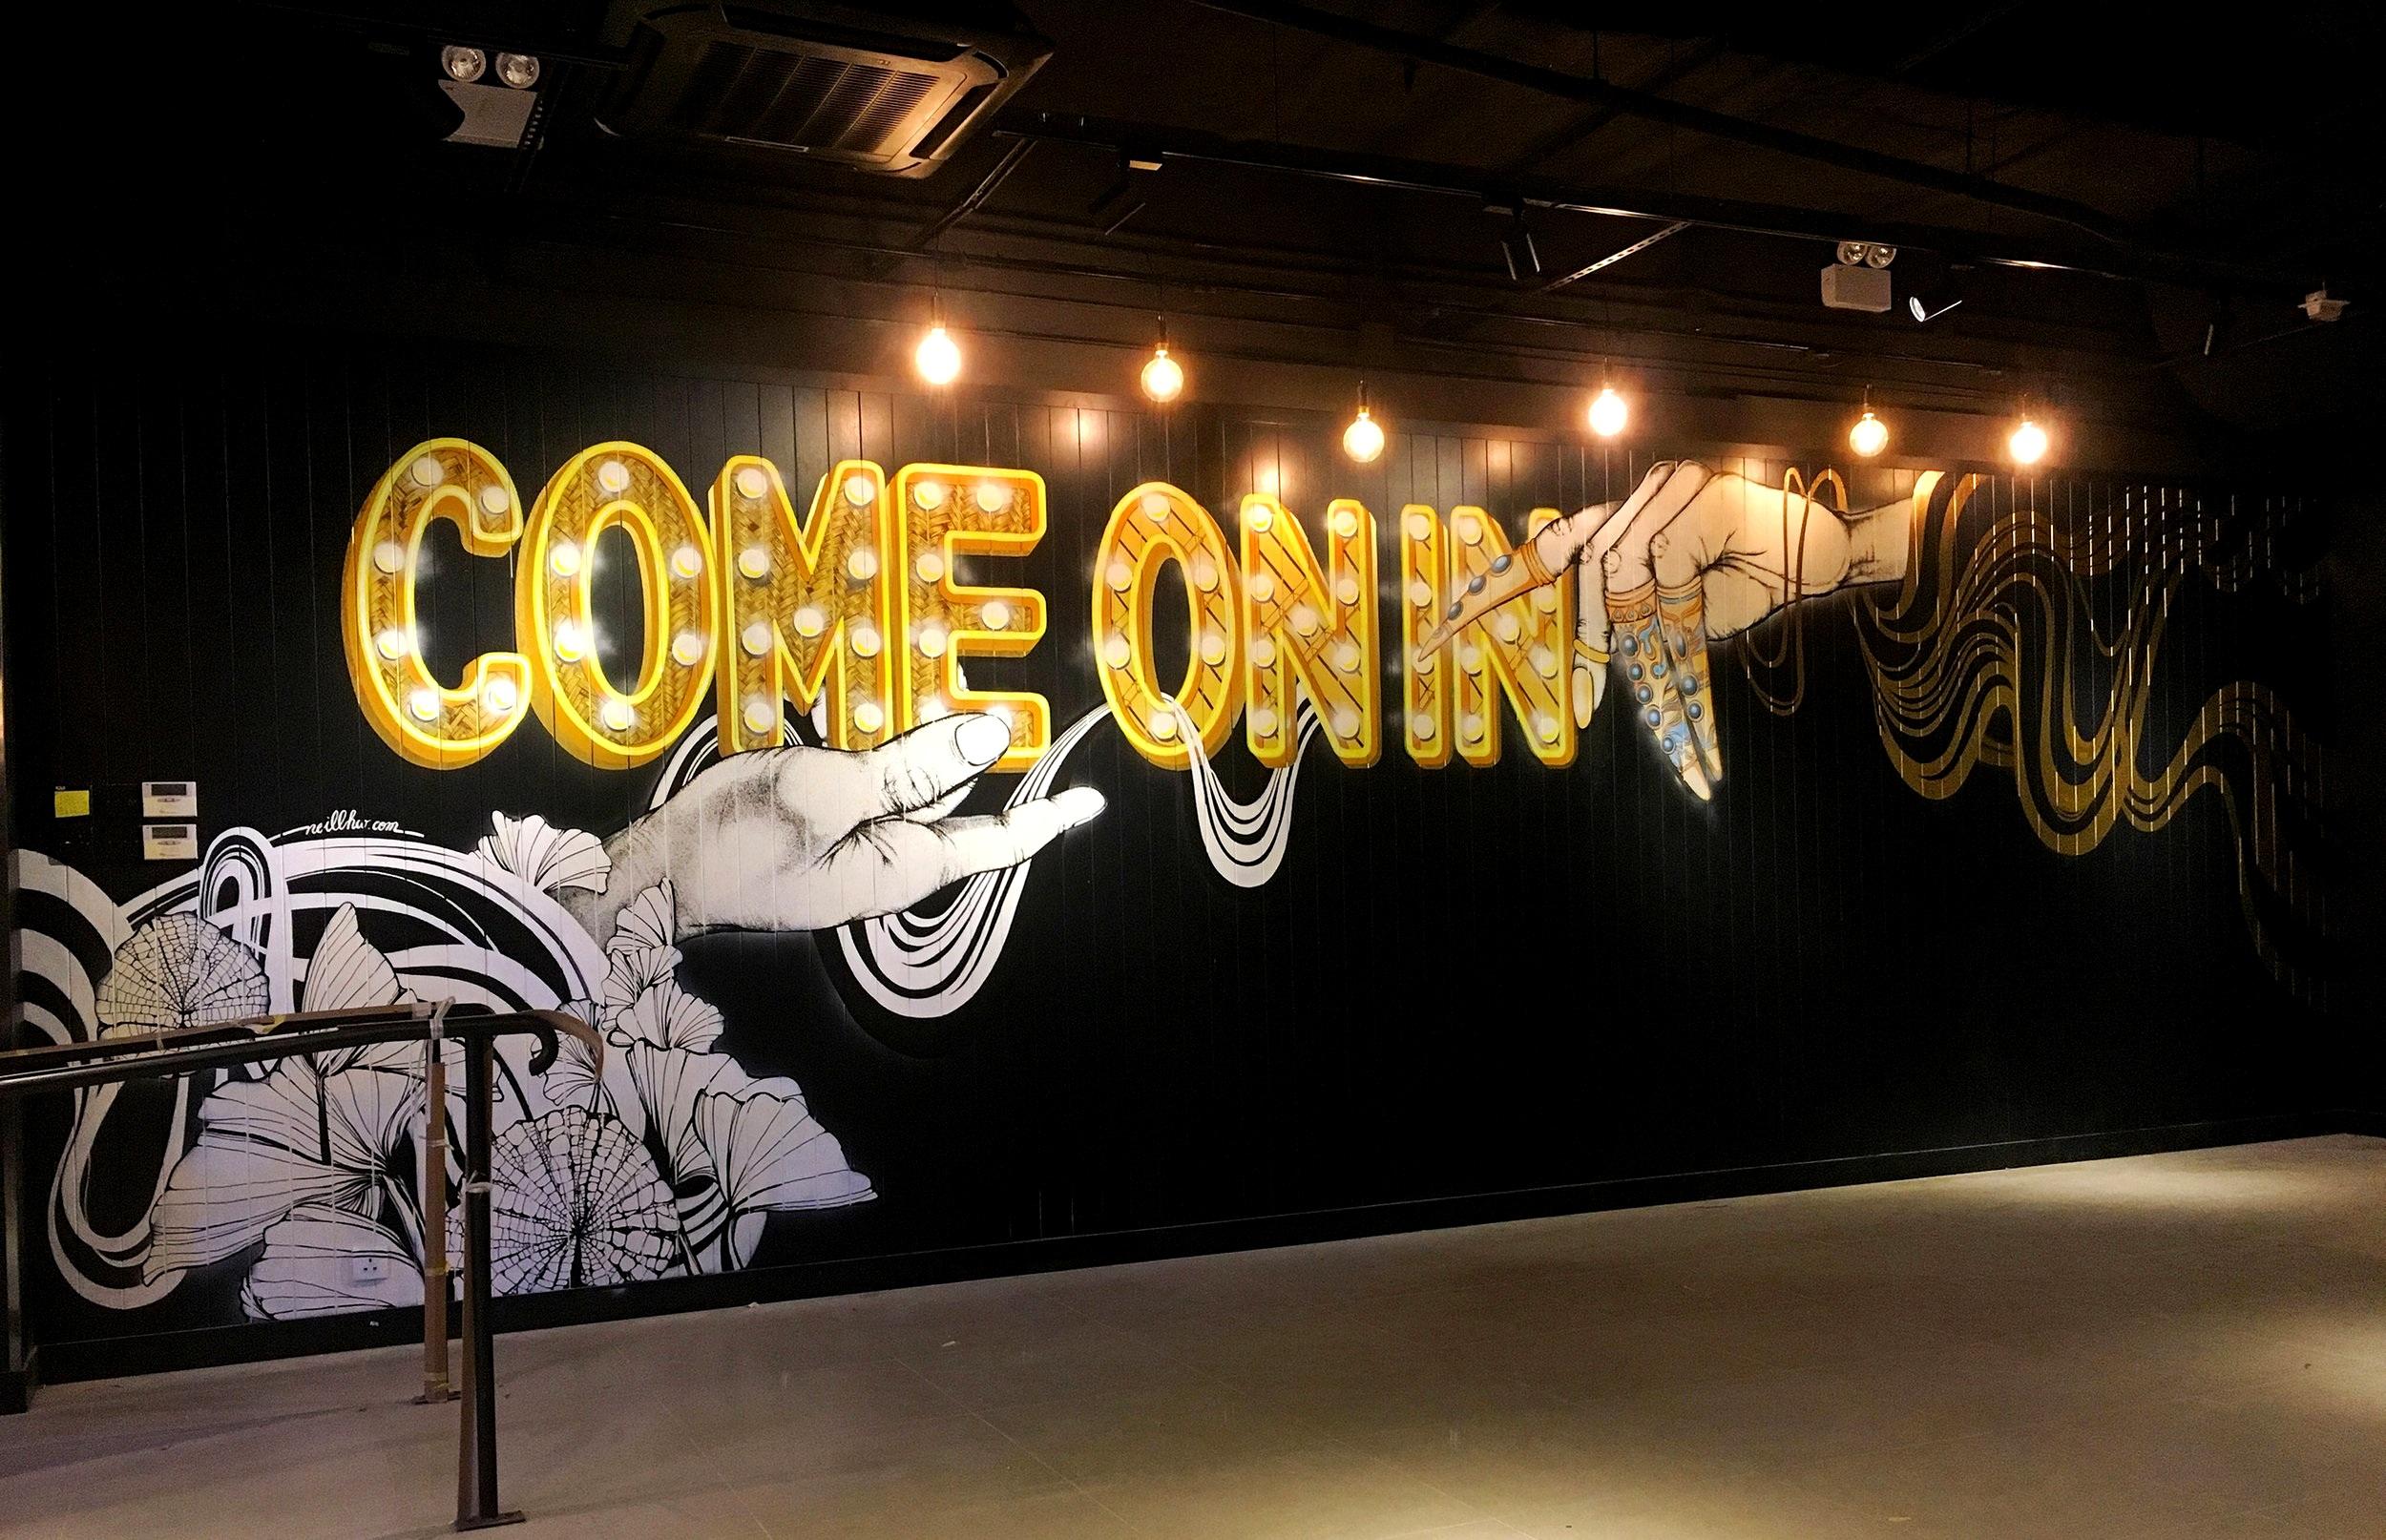 Restaurant Mural - Dim sum restaurantLocation: Kwun Tong, HK(2018)